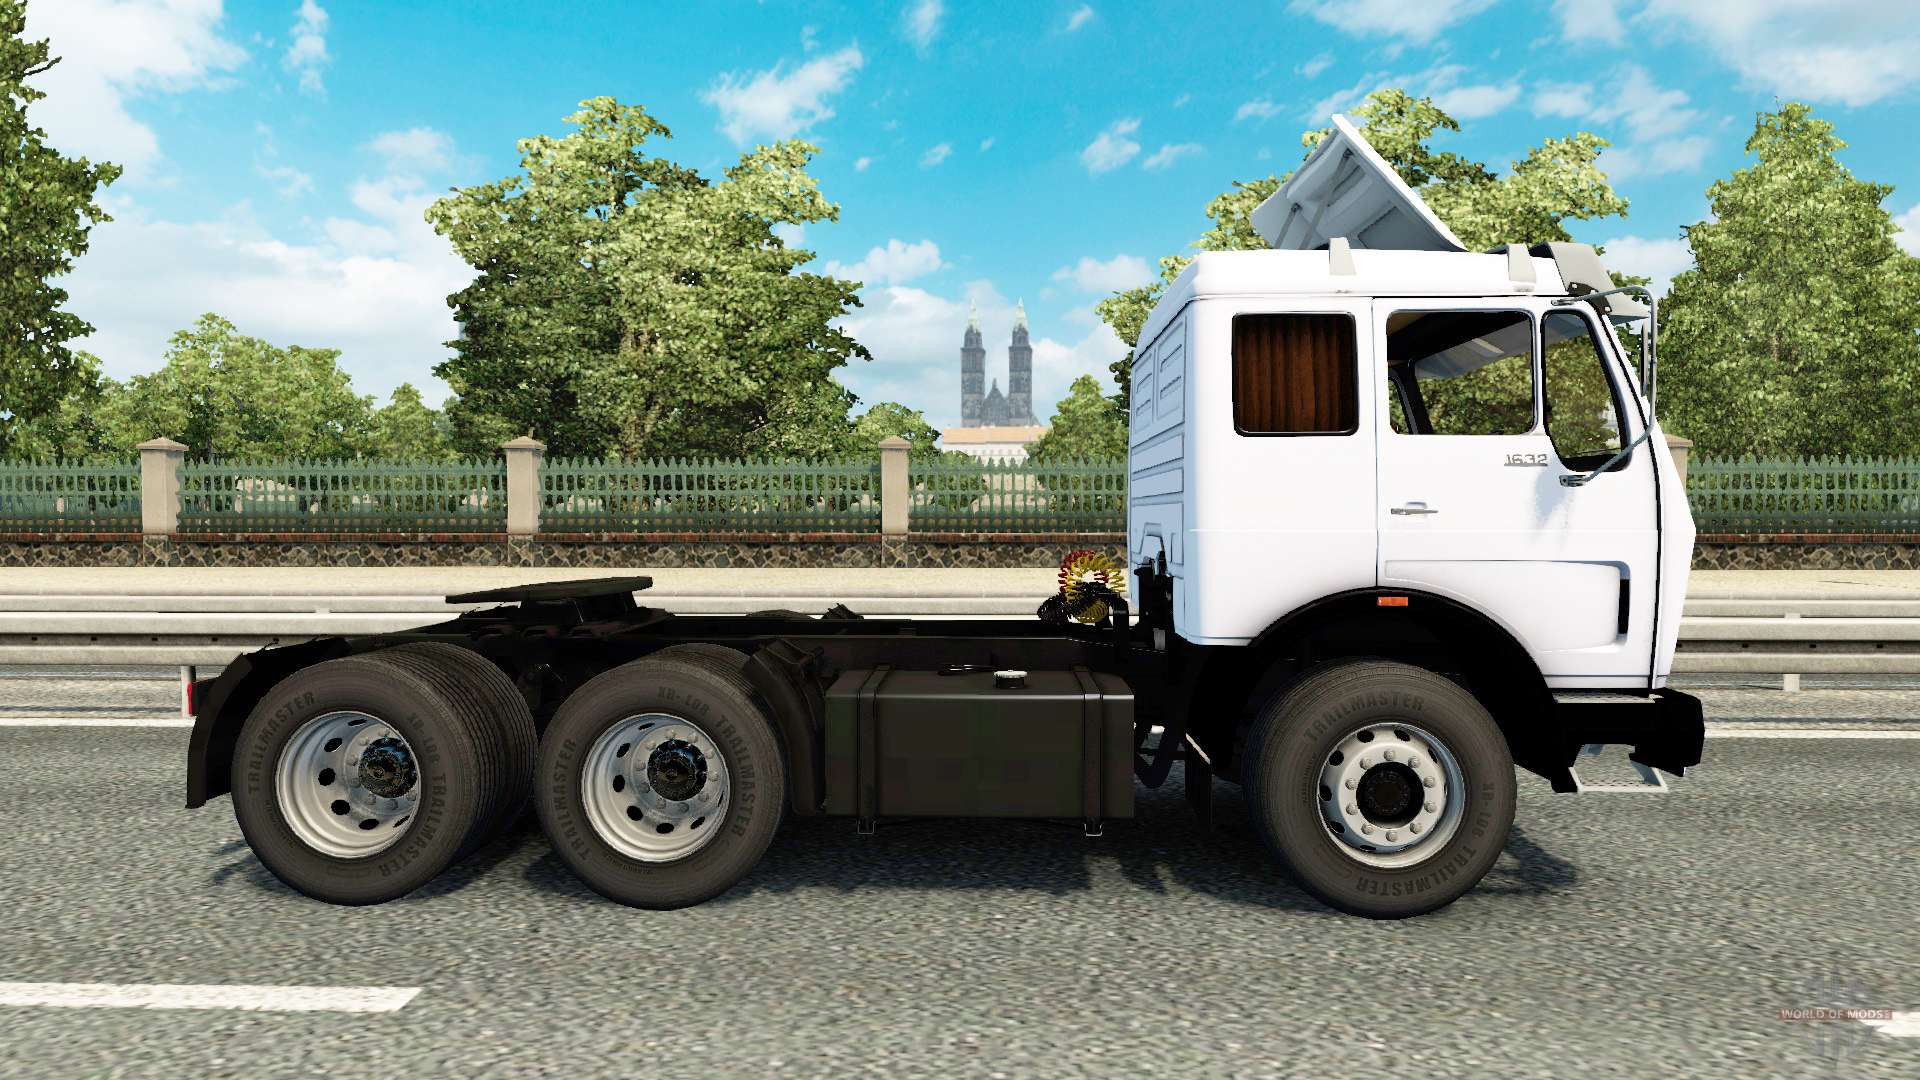 https://www.nvidia.com/en-us/geforce/news/the-very-best-euro-truck-simulator-2-mods/